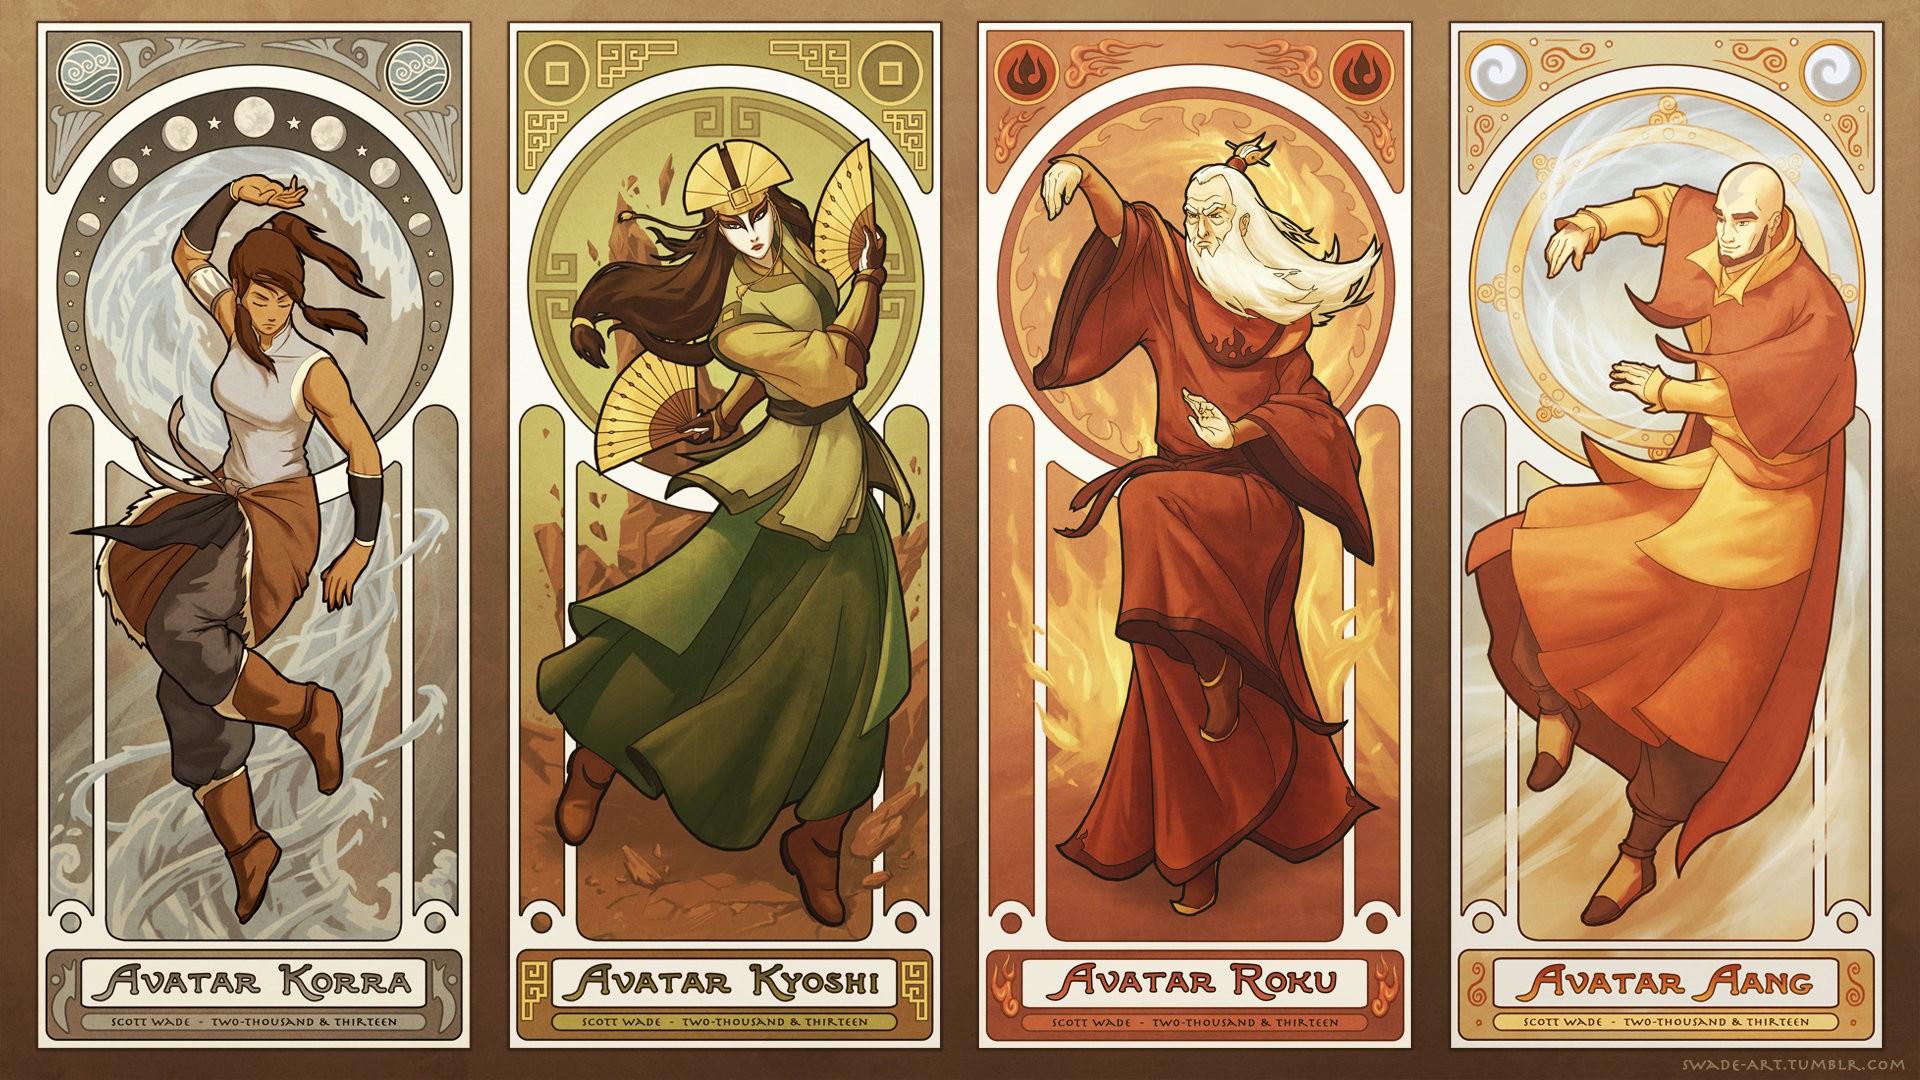 Wallpaper Illustration Elements Korra Comics Avatar The Last